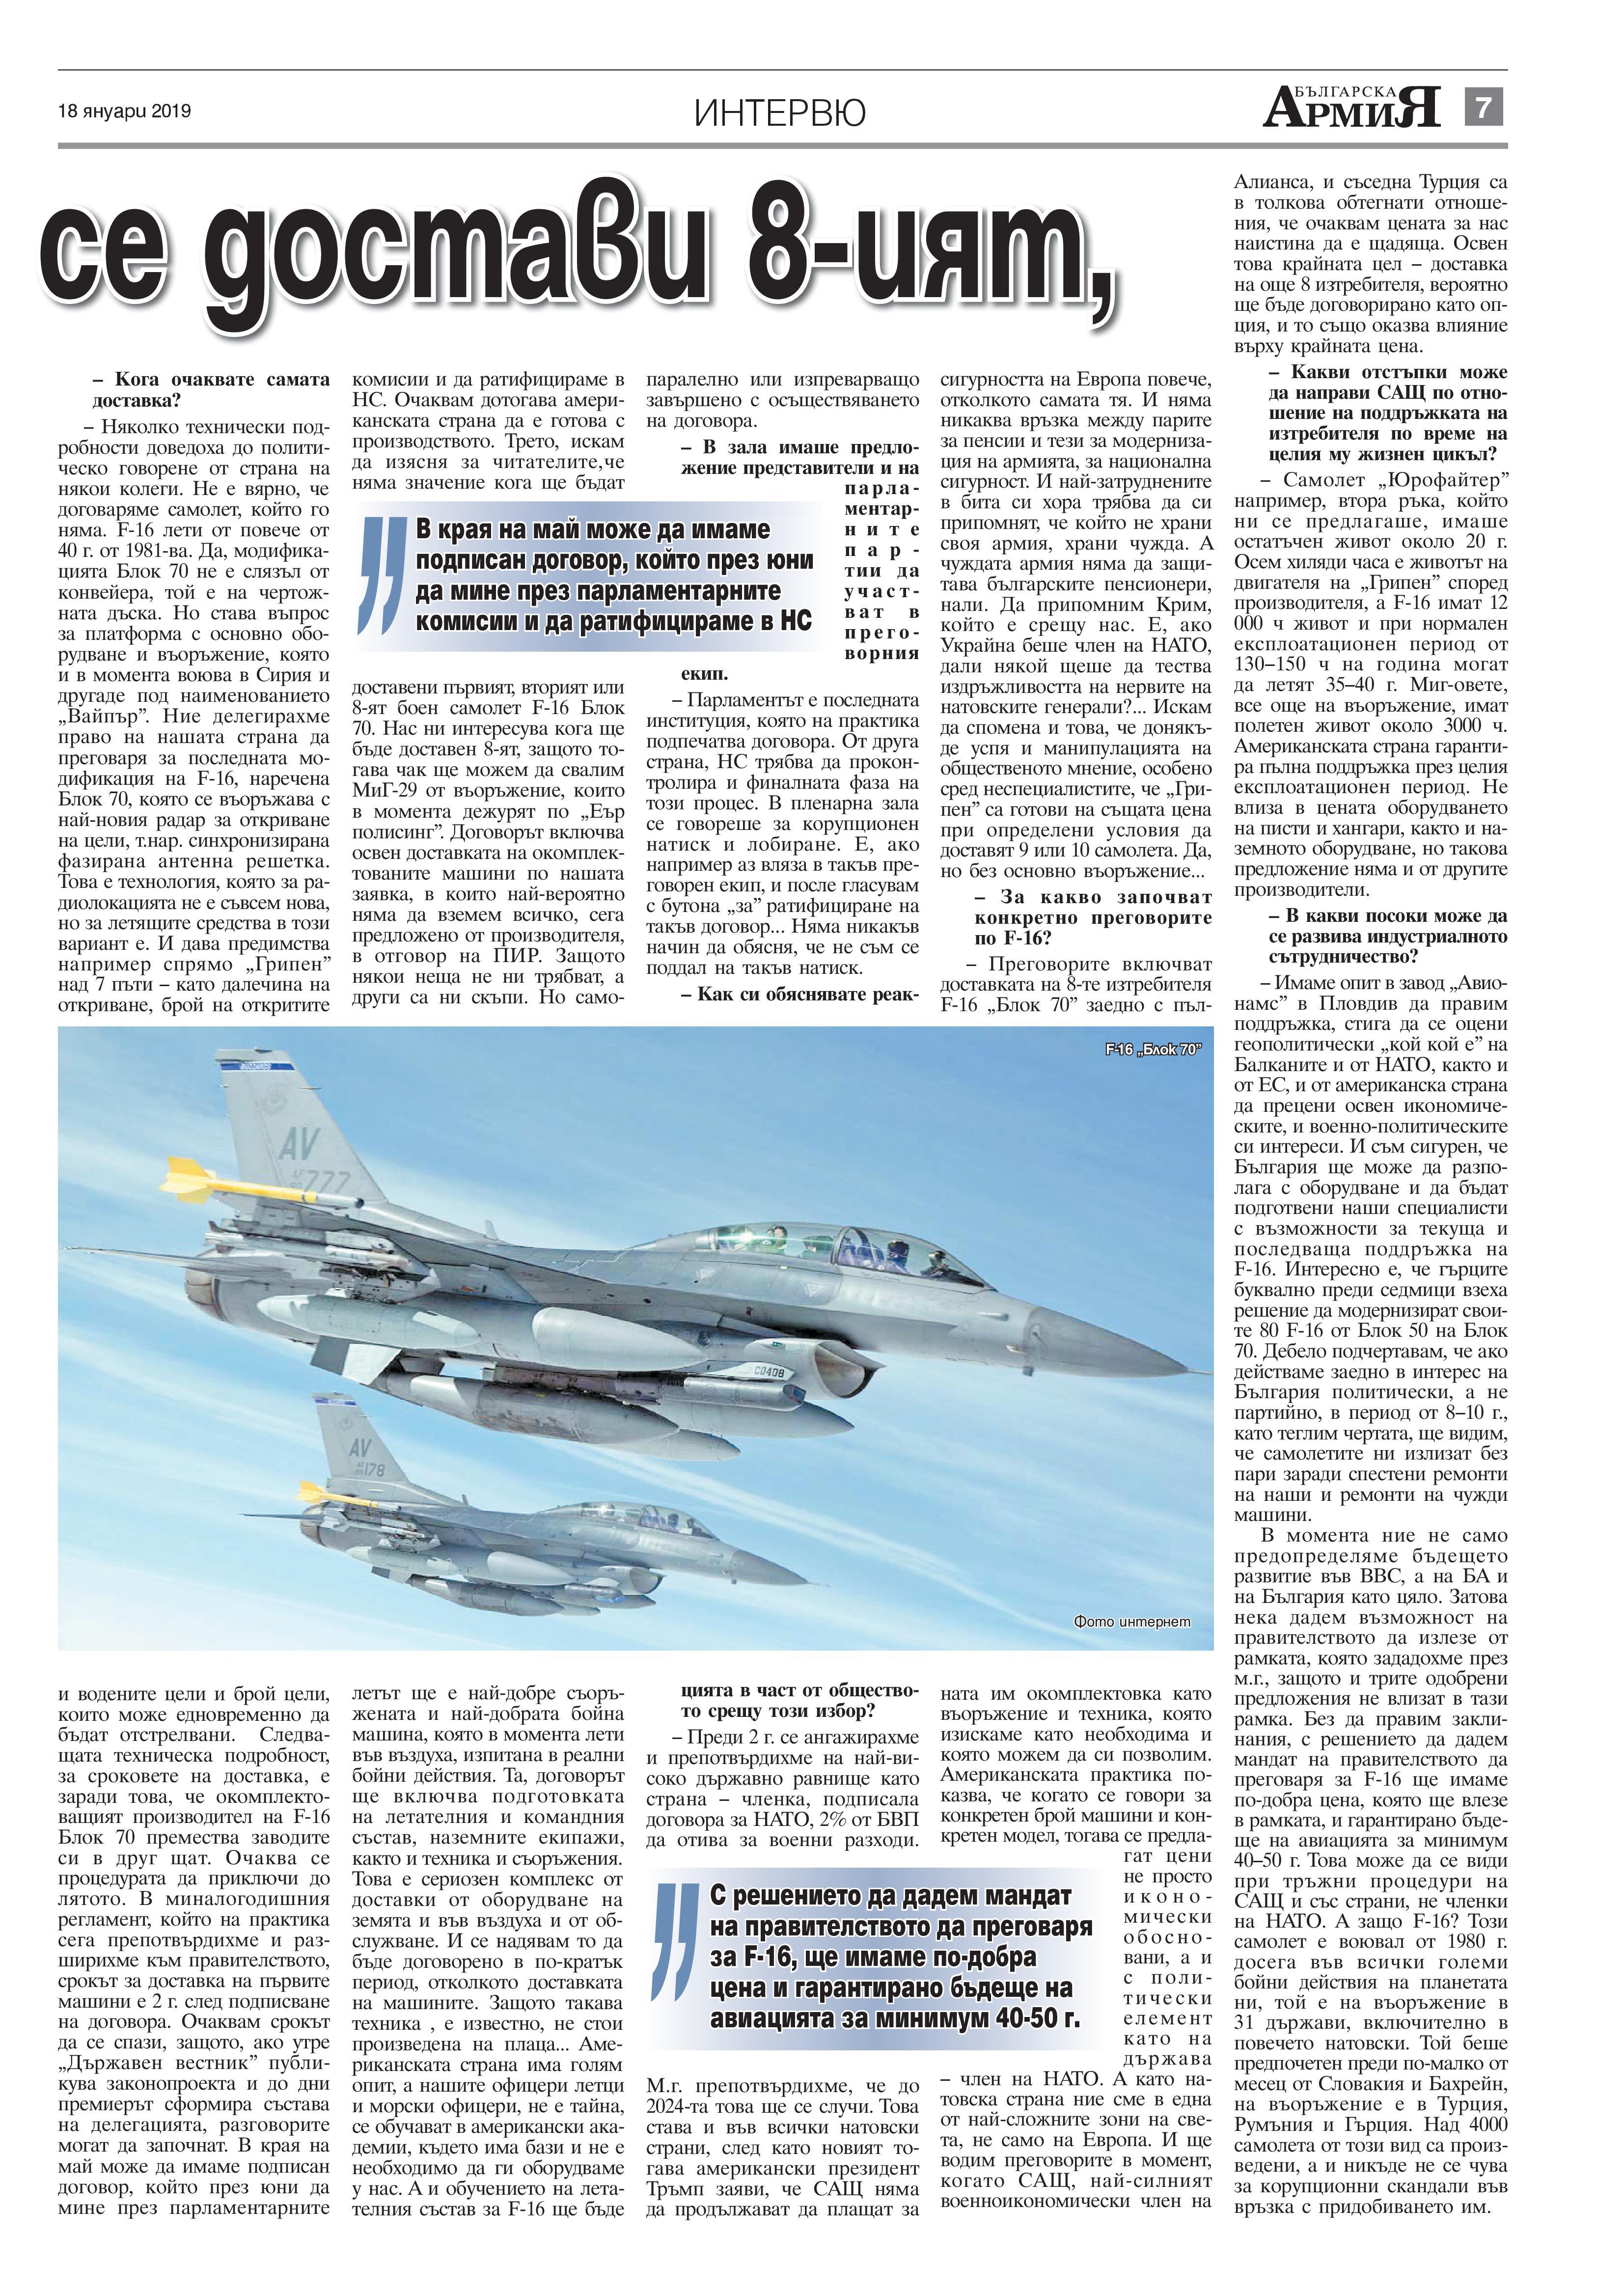 https://armymedia.bg/wp-content/uploads/2015/06/07-25.jpg